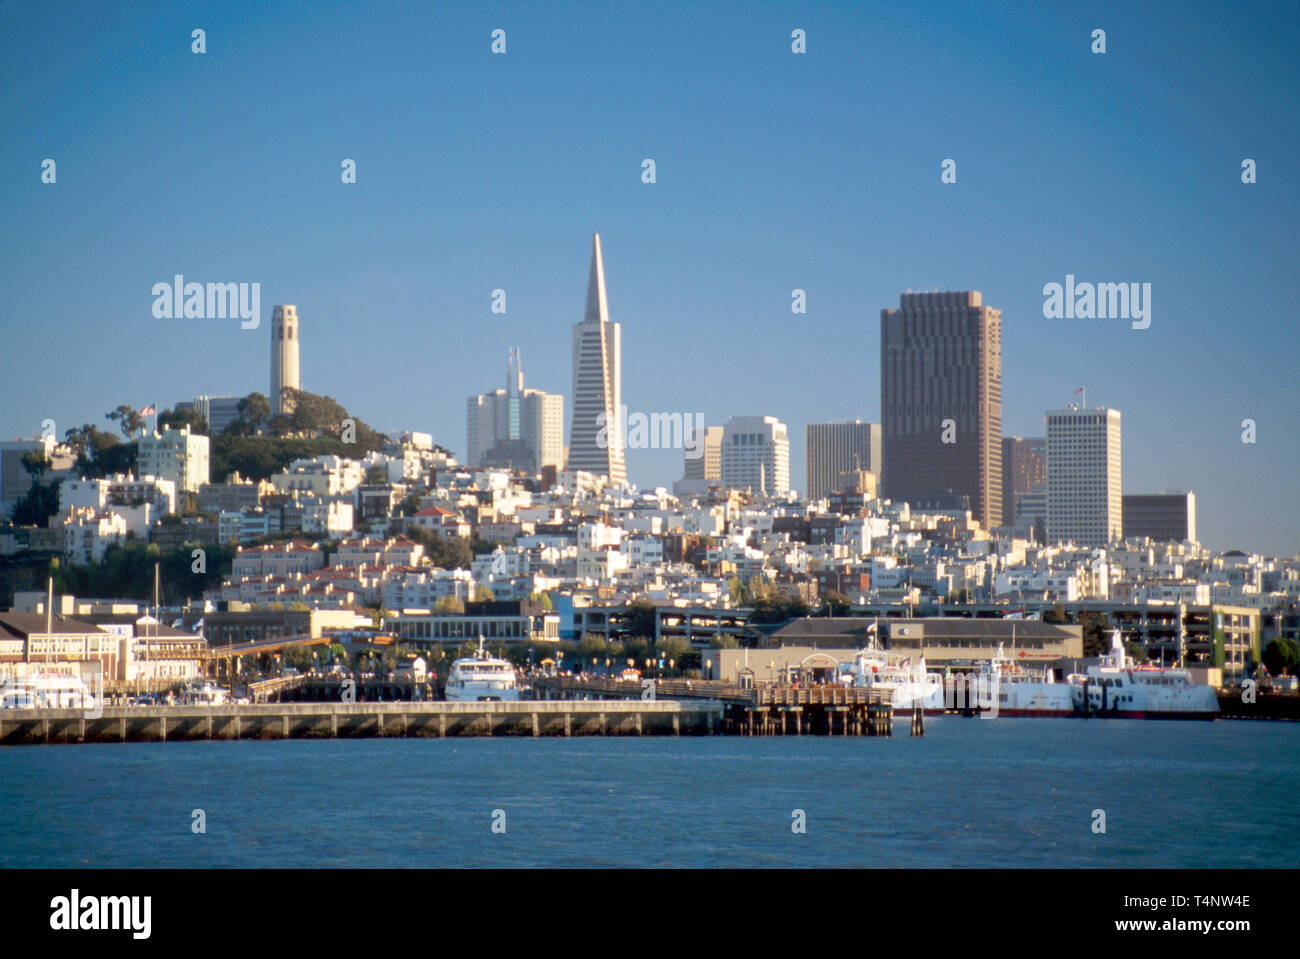 San Francisco California skyline from San Francisco Bay - Stock Image